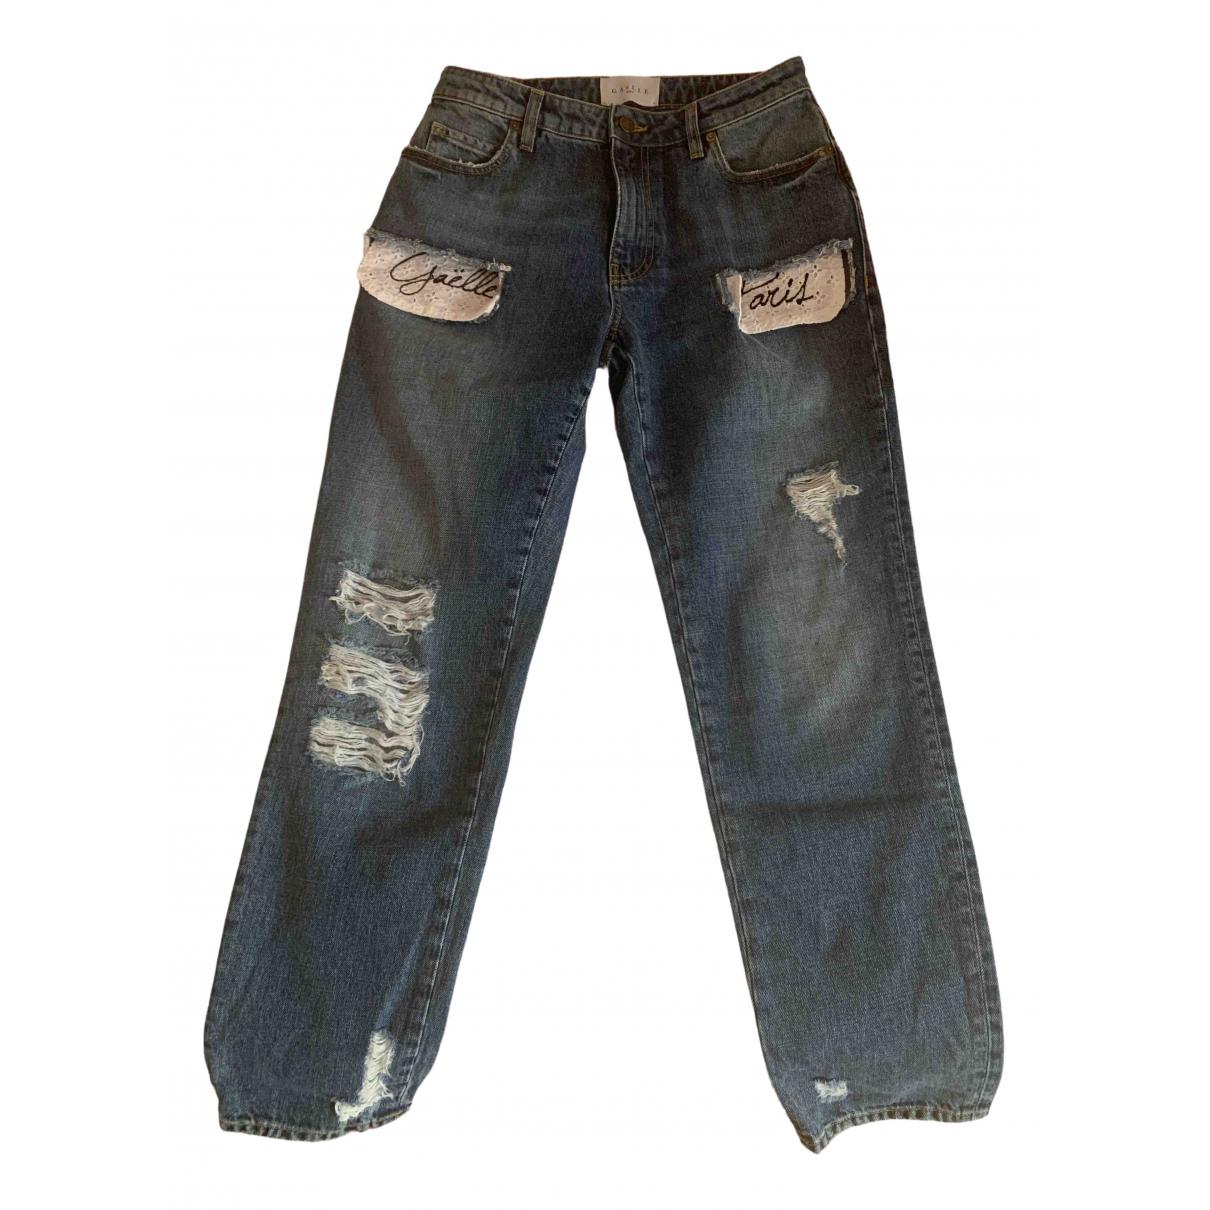 Gaelle Paris \N Blue Denim - Jeans Jeans for Women 38 FR